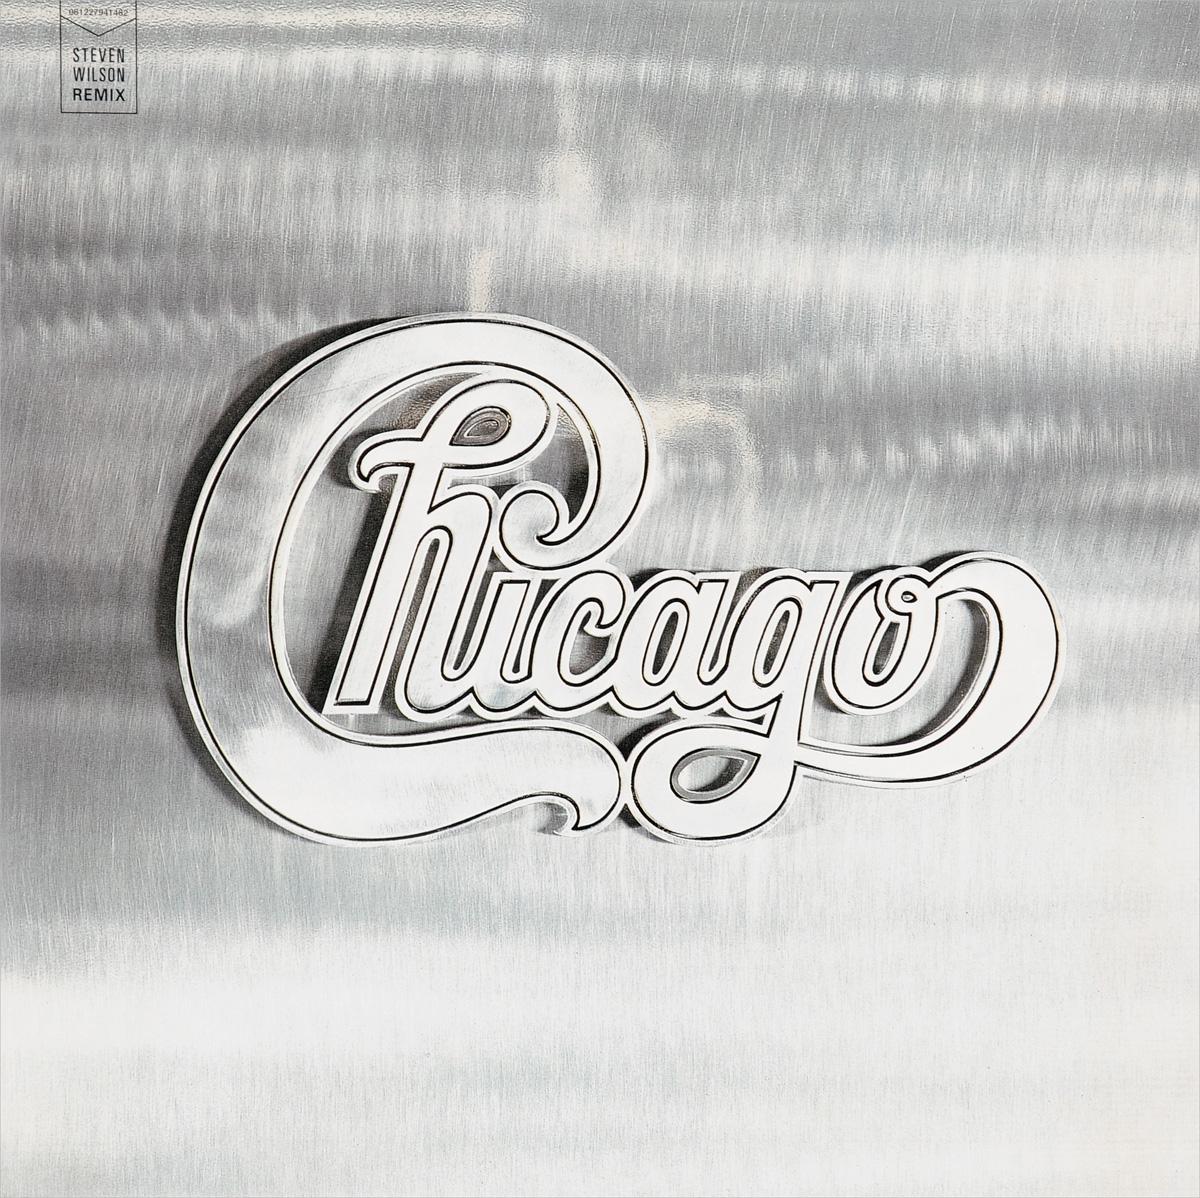 Chicago. Chicago (Steven Wilson Remix) (2 LP) steven wilson melbourne